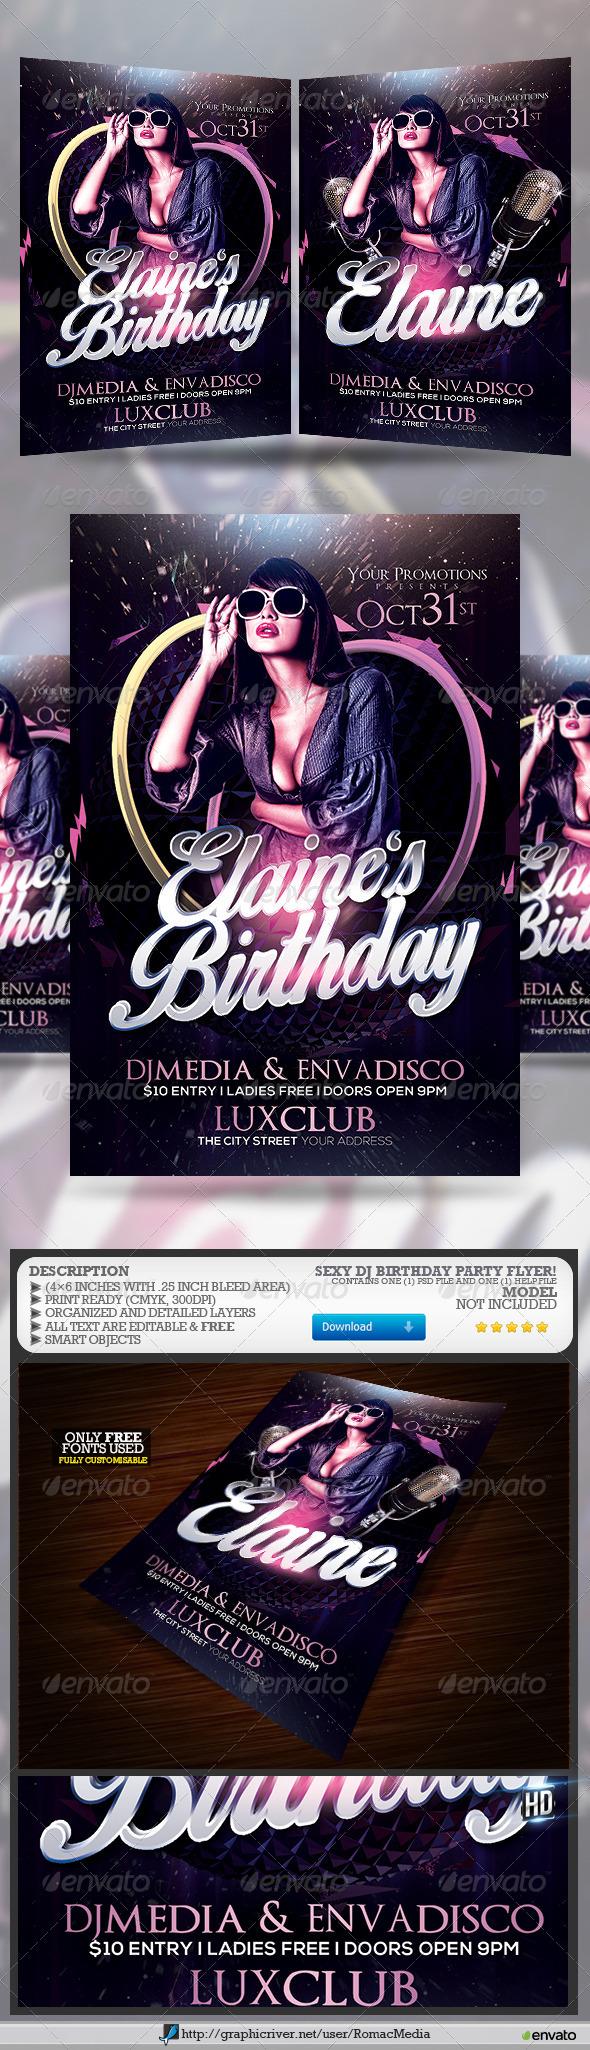 Sexy DJ Birthday Party